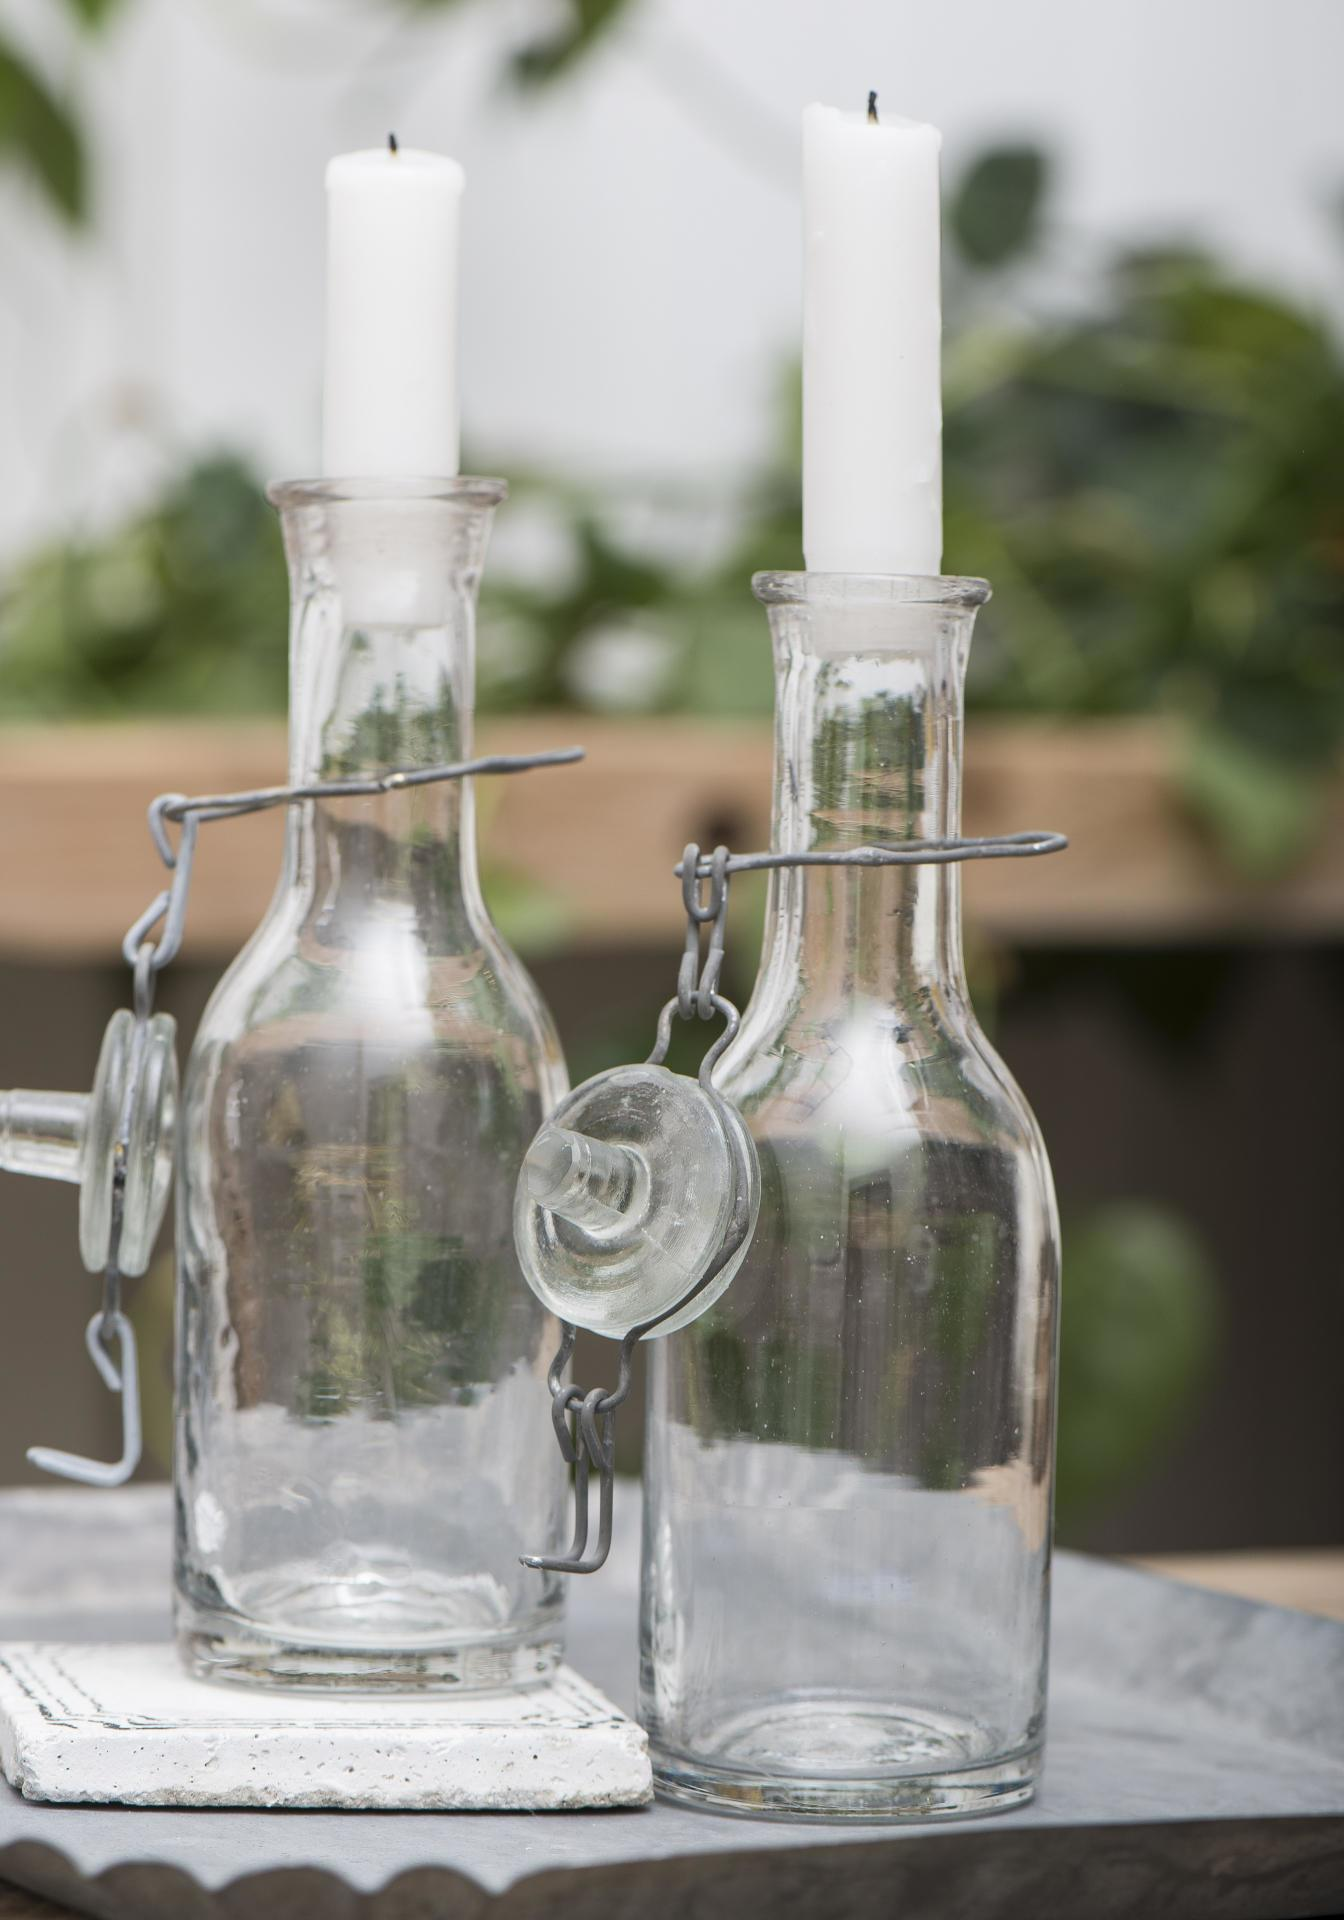 IB LAURSEN Skleněný svícen v podobě lahve, čirá barva, sklo